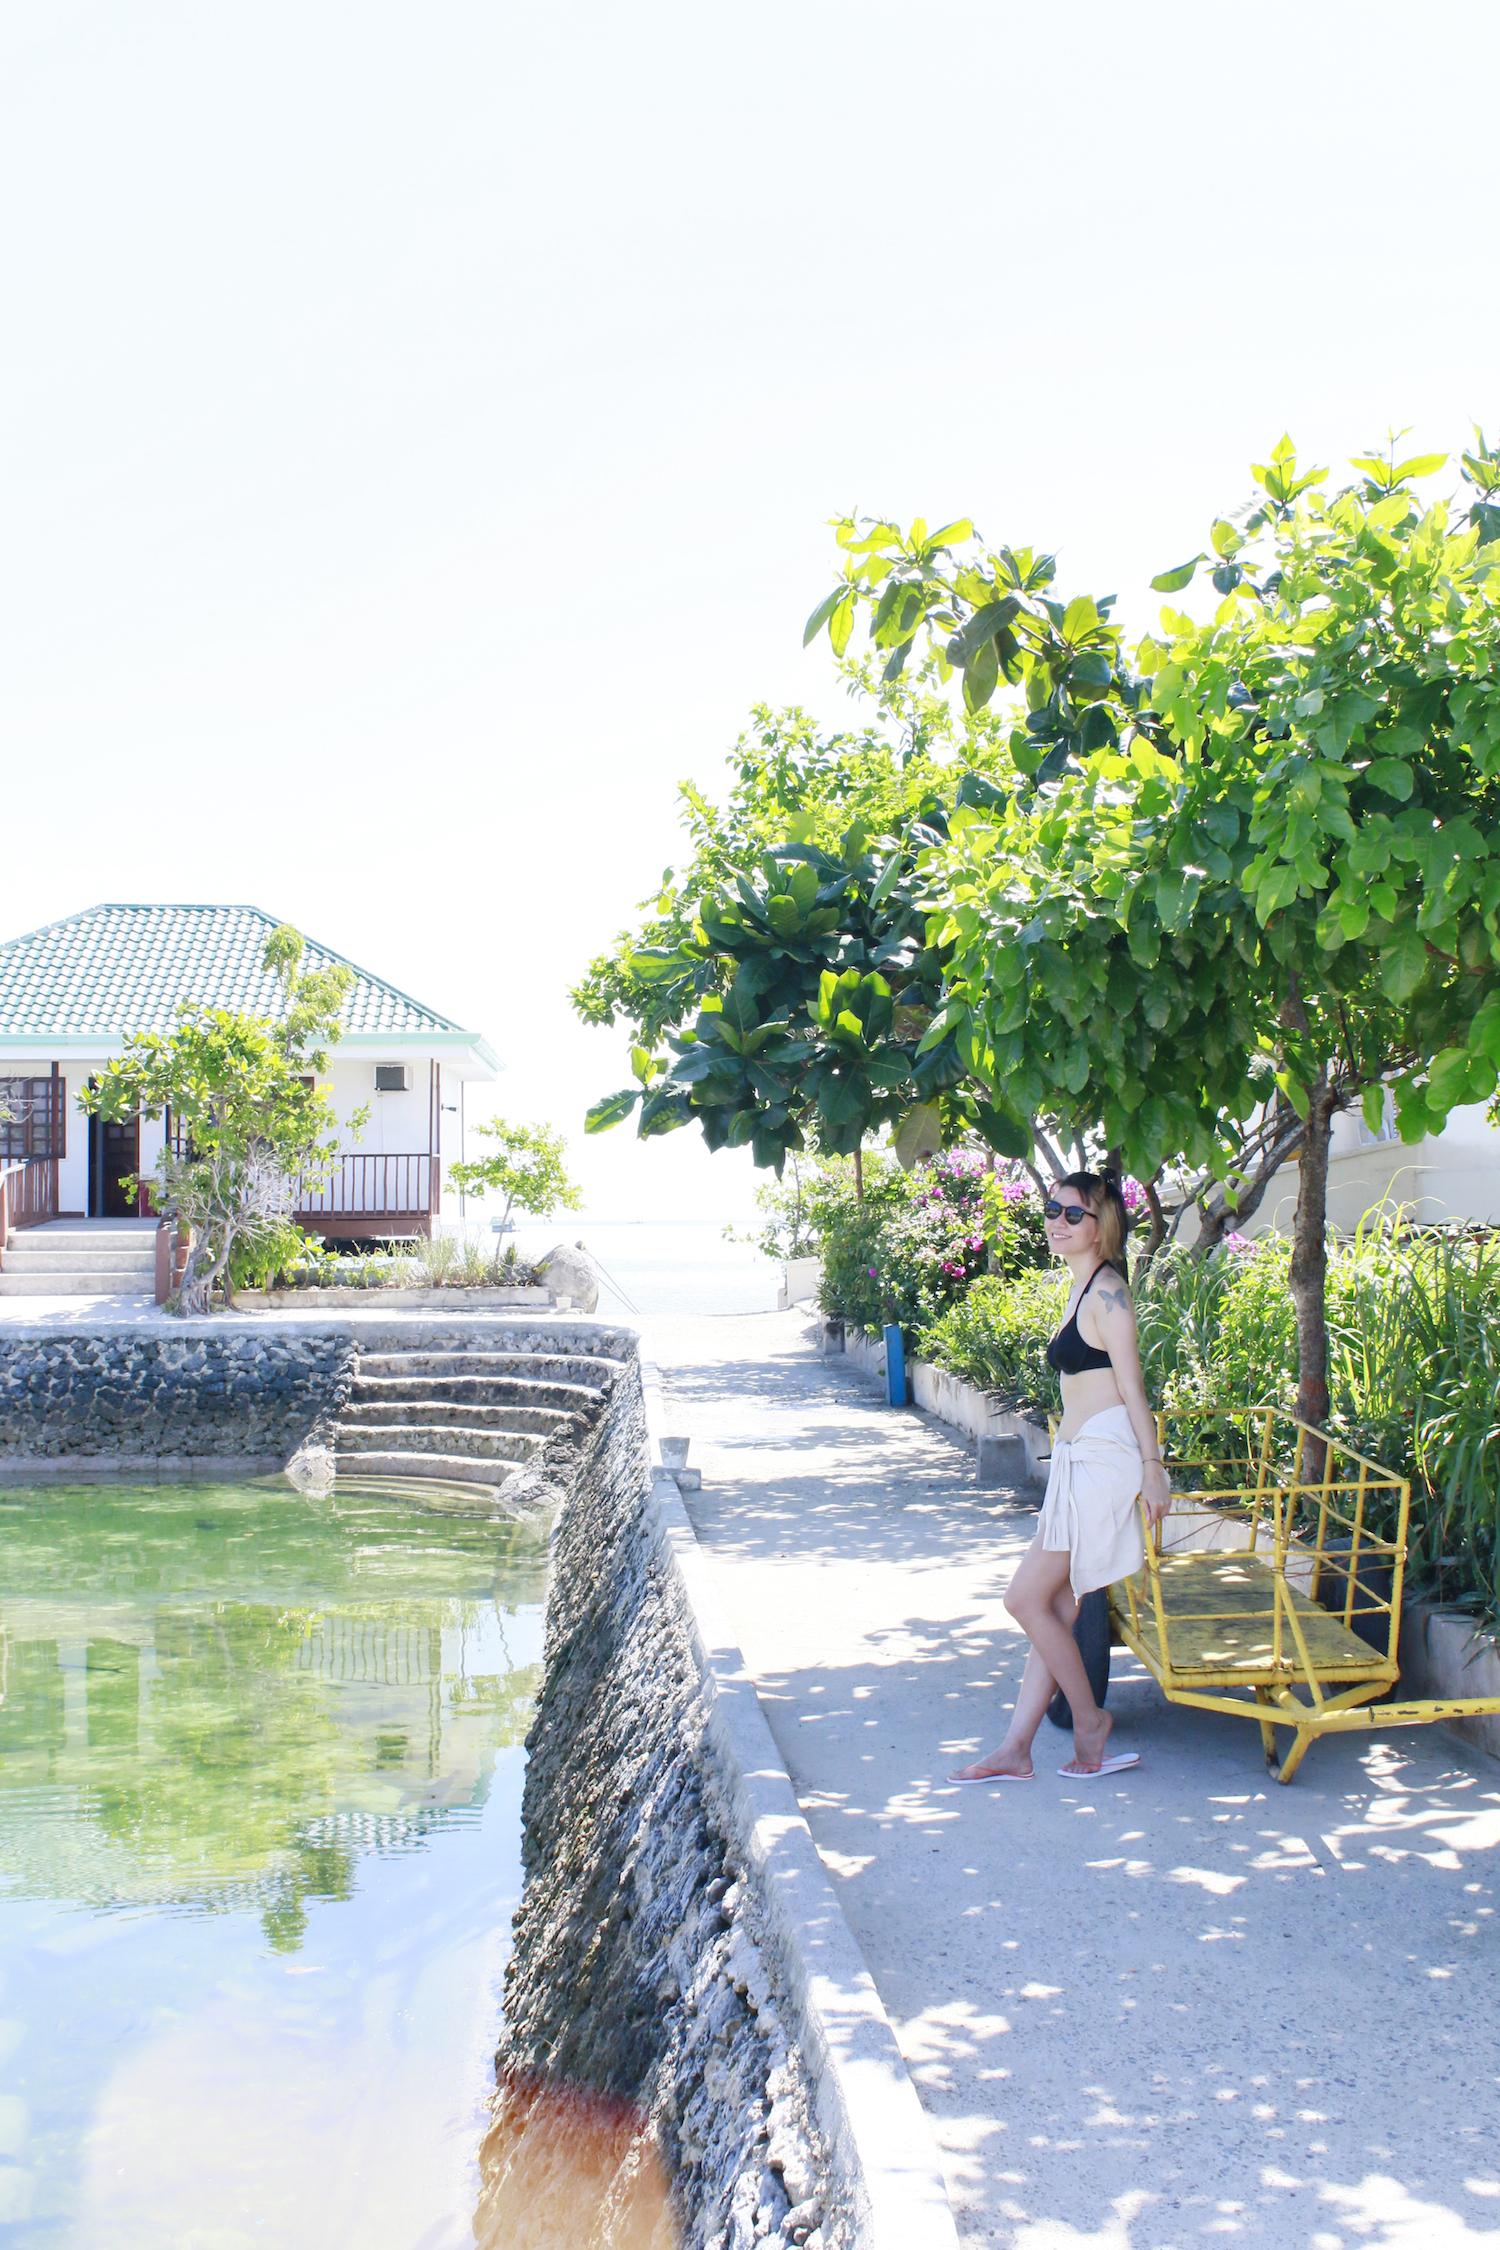 Josie Natori Philippines_Cebu_25